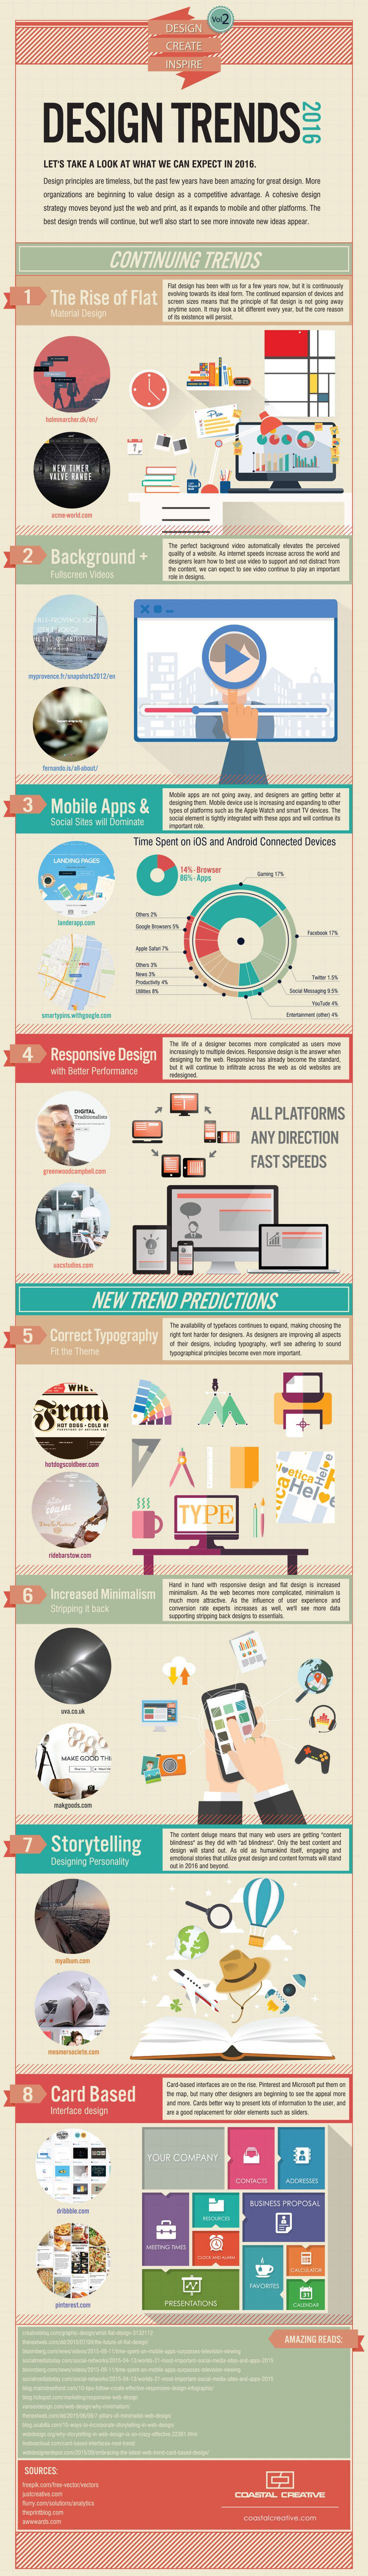 design trends 2016 (Infographic)